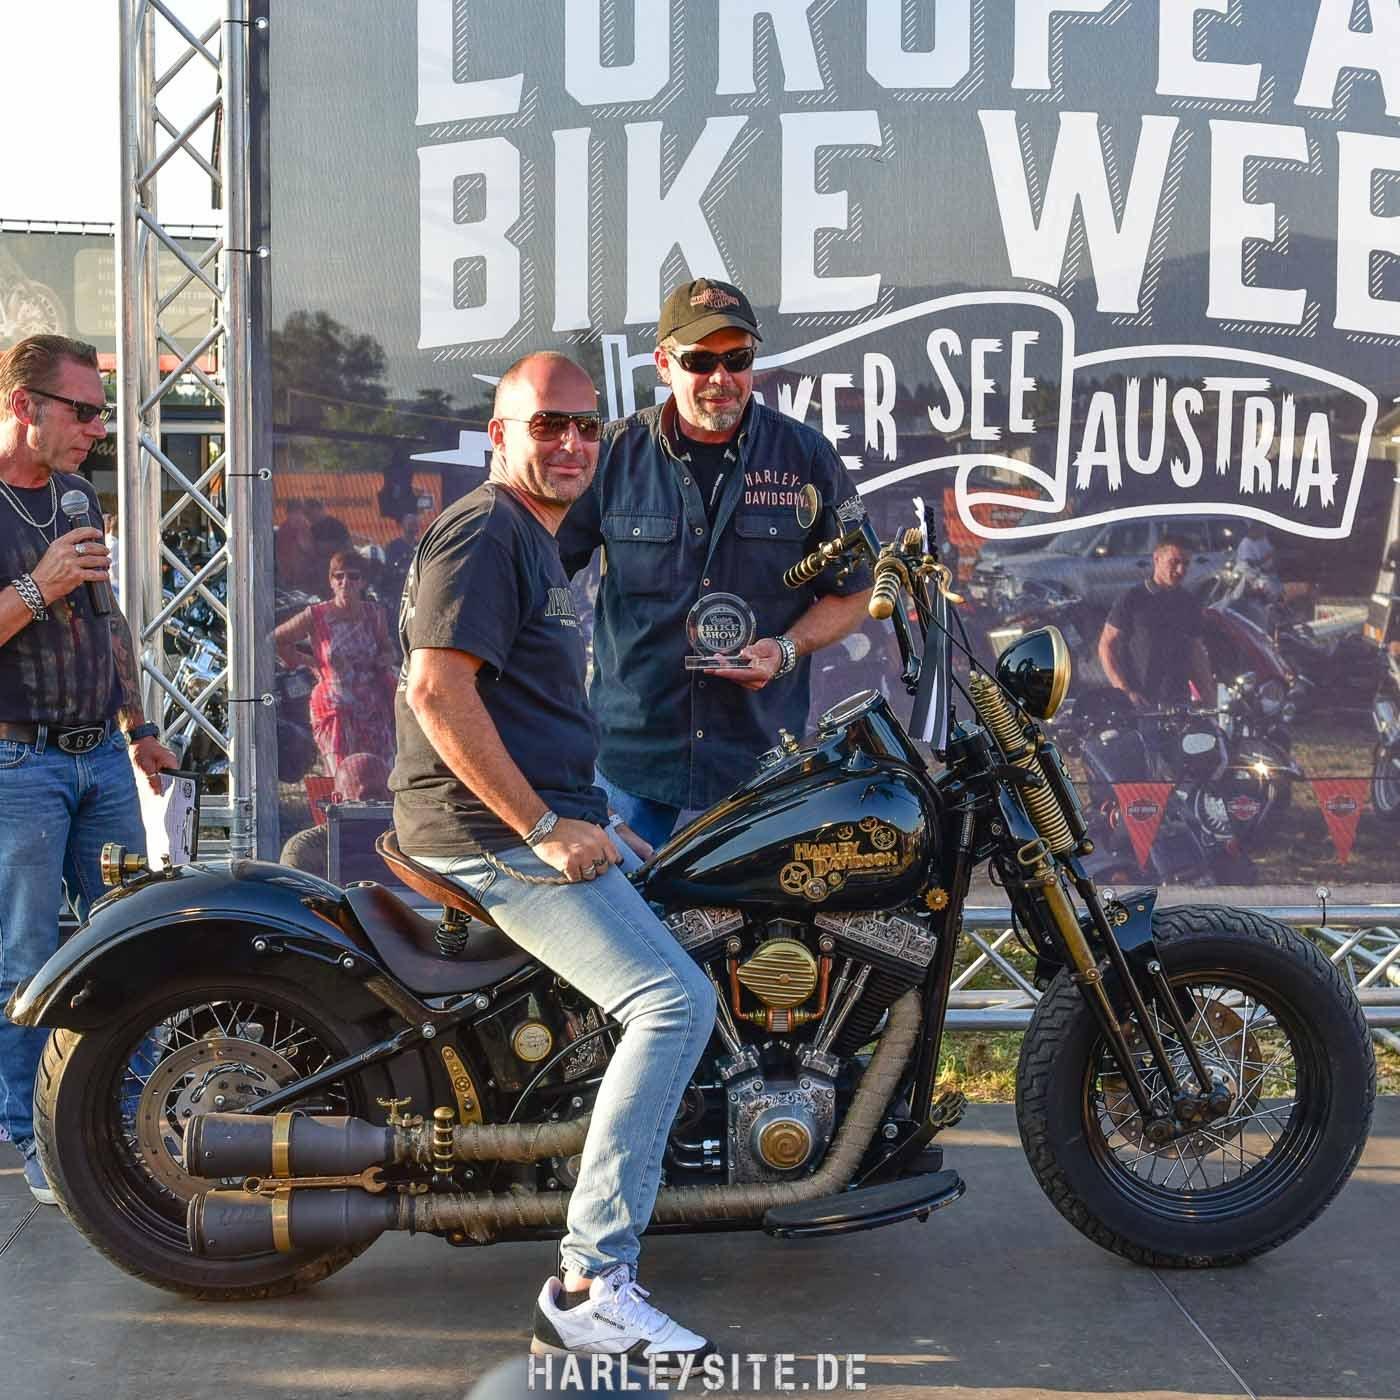 European-Bike-Week-0745